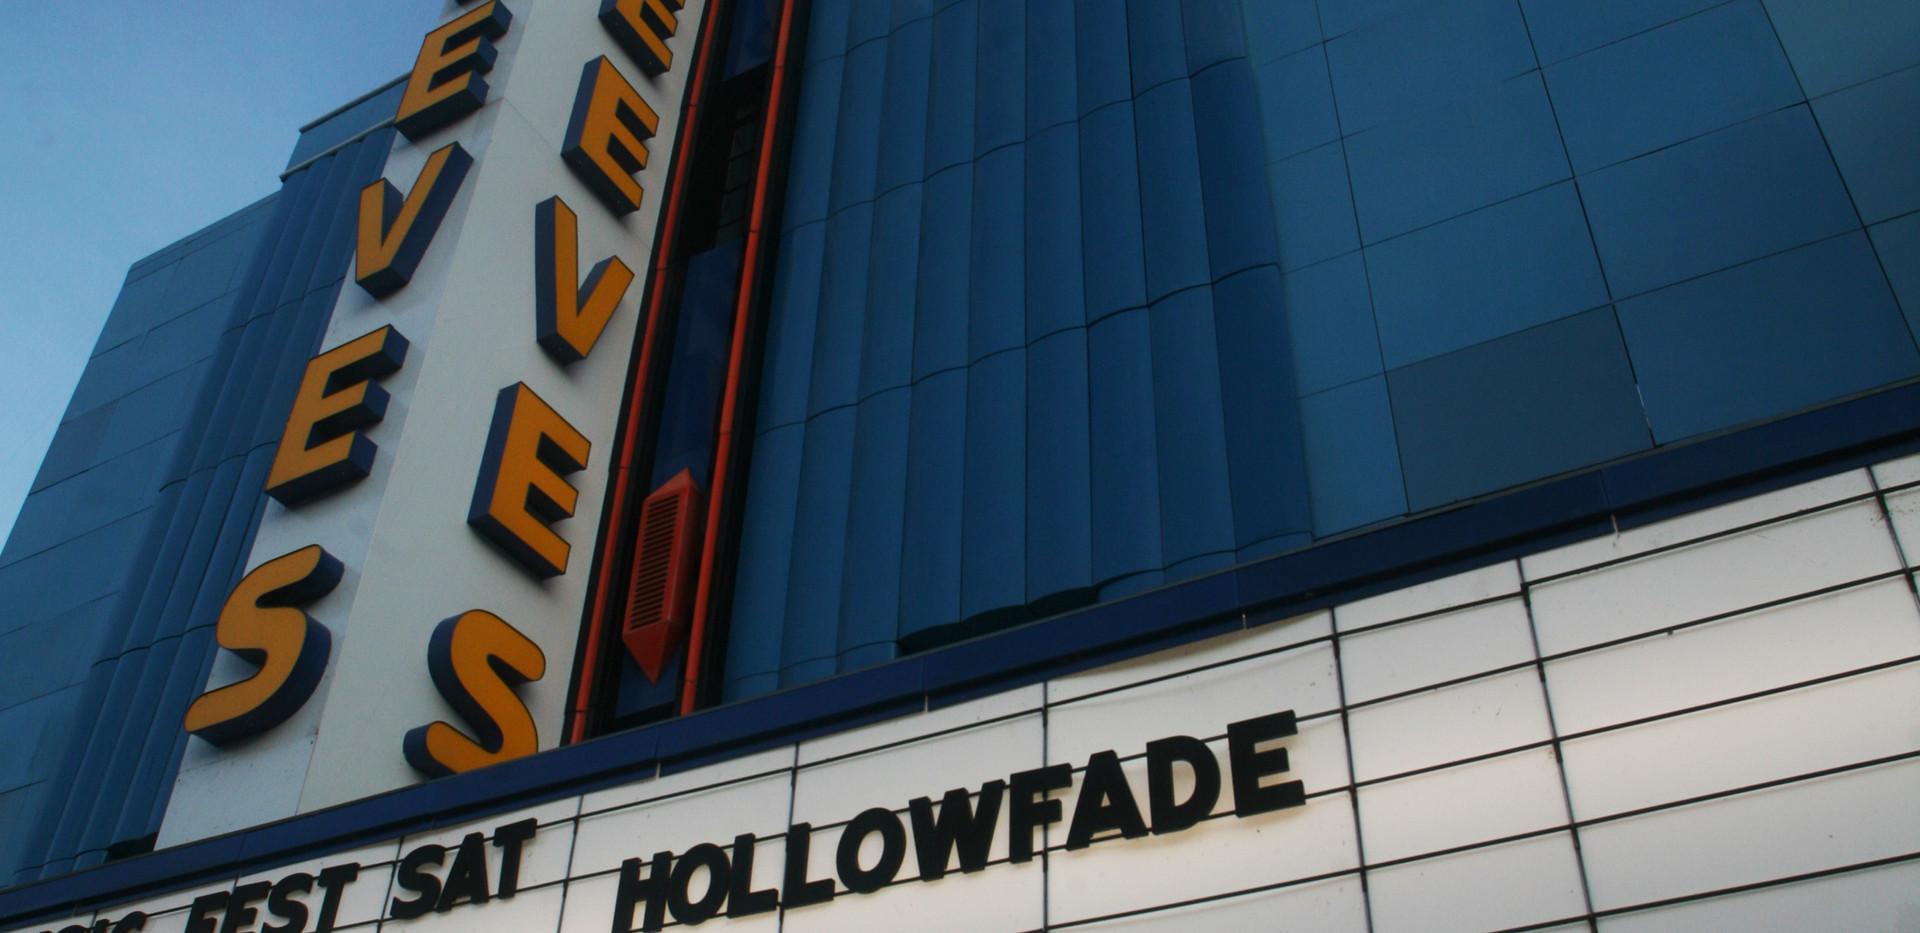 hollowfade3.jpg